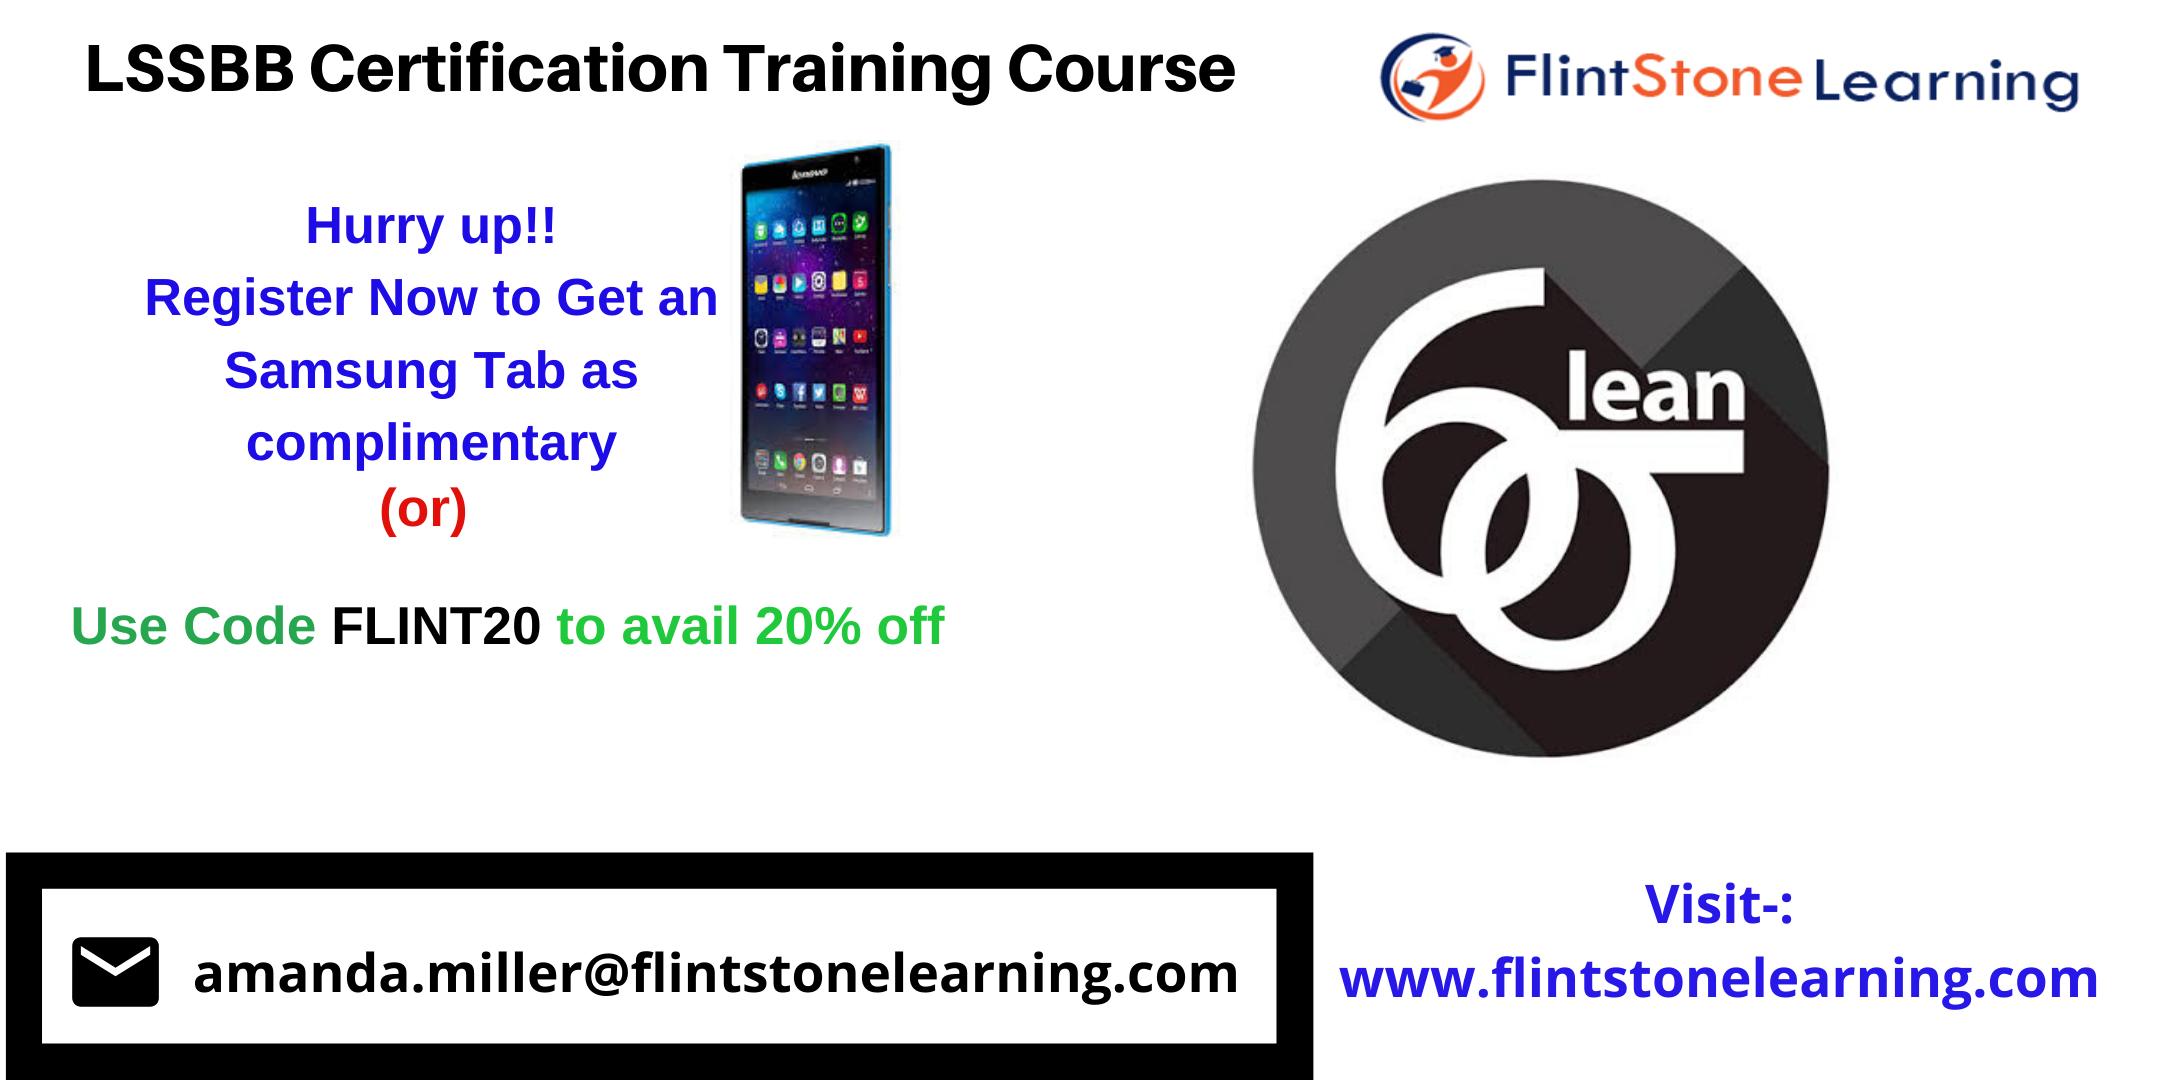 LSSBB Certification Classroom Training in Kelowna, BC